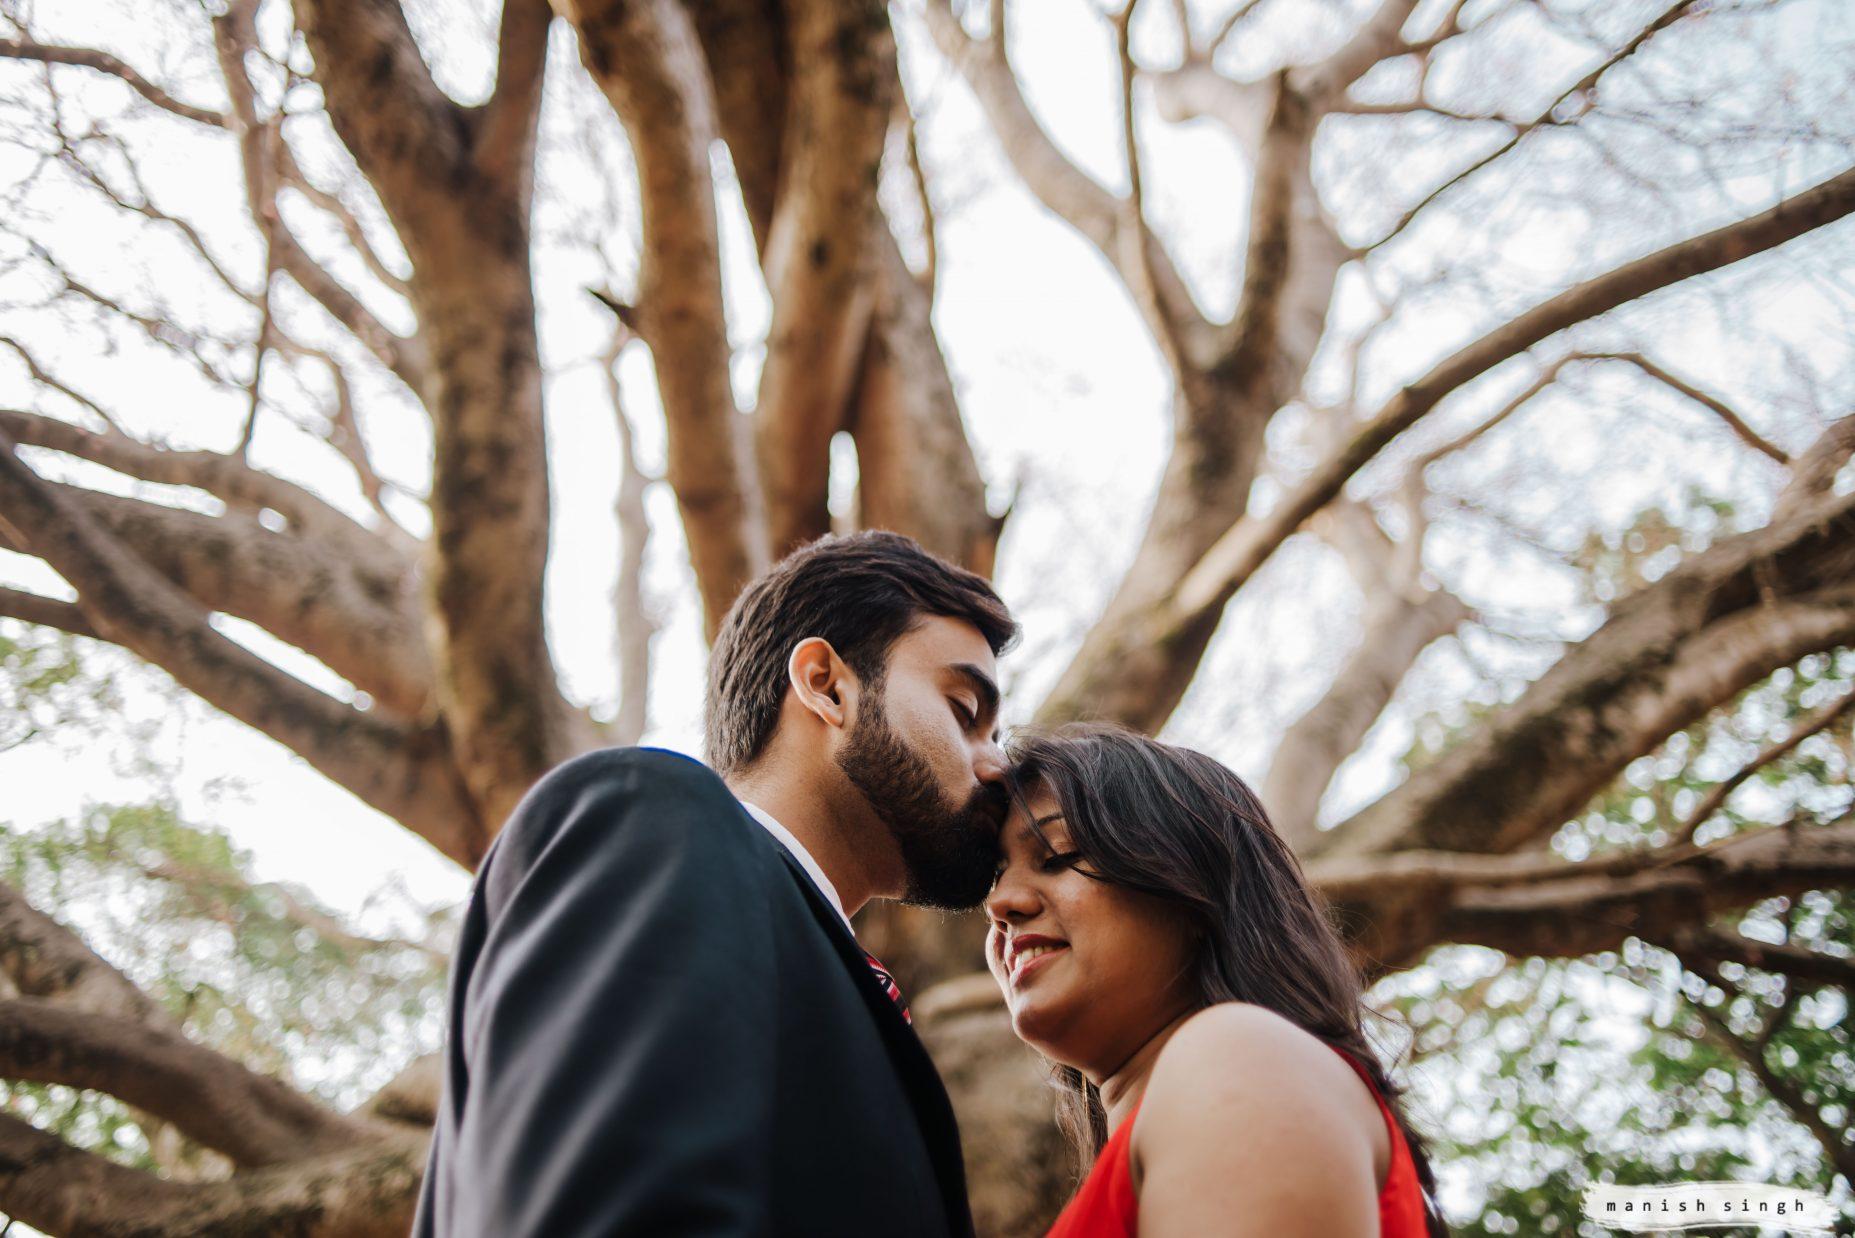 _Manish Singh Photography wedding photographer bhubaneswar_-30